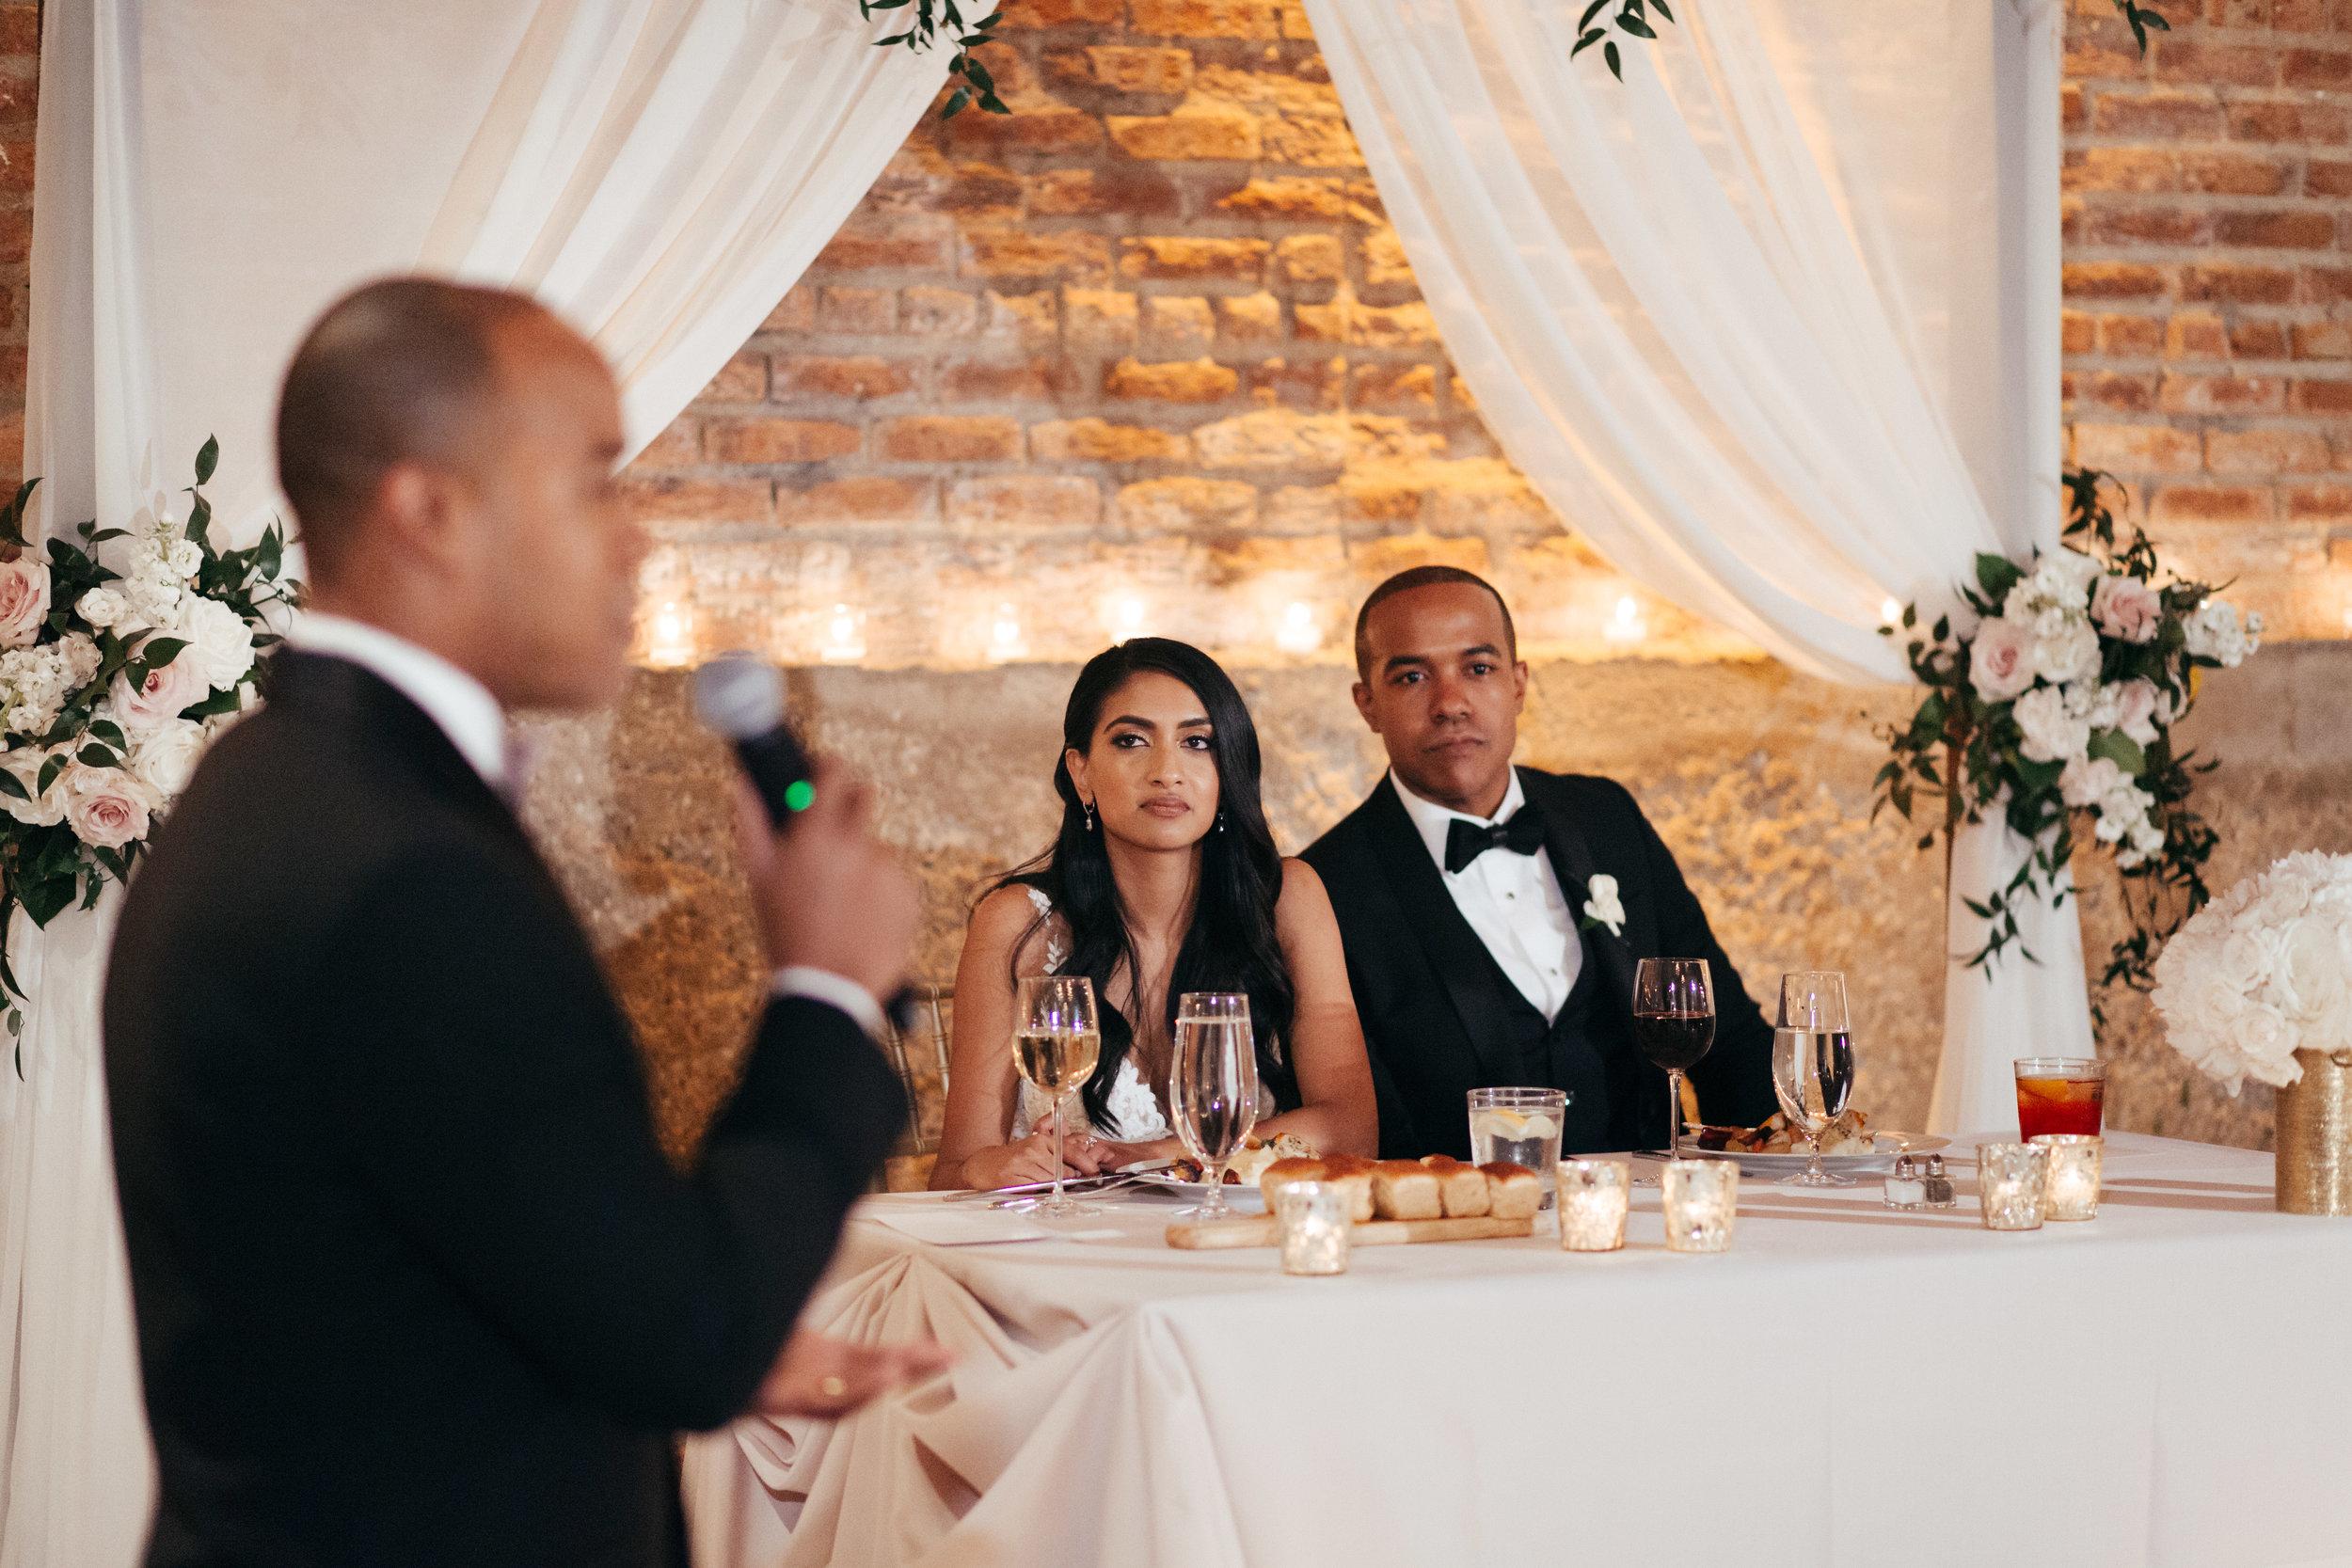 Mindy&Jared-wedding-by-LadiesAndGentlemen-by-Matija-Vuri-5409.jpg